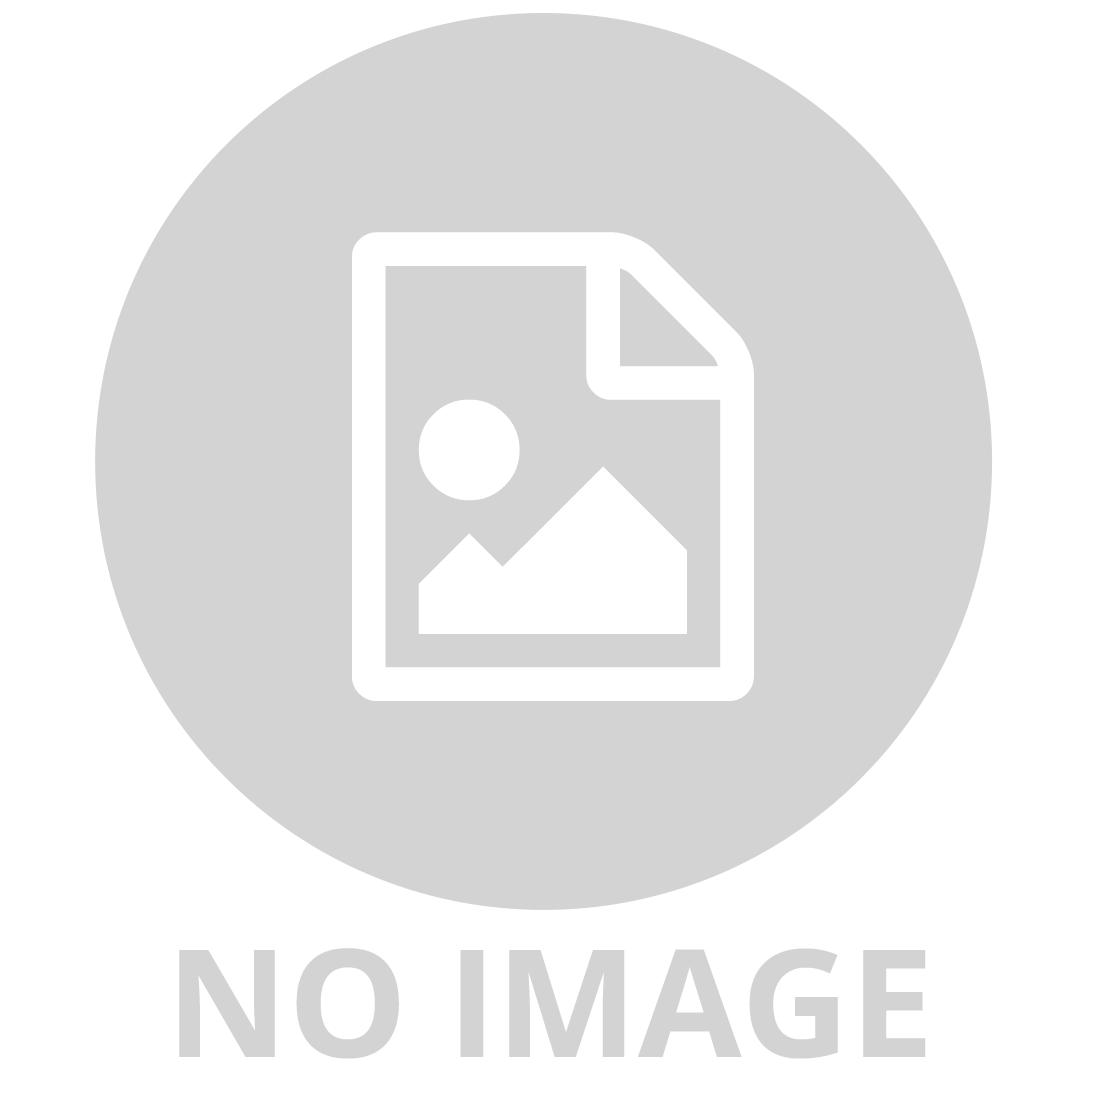 BUNCH A BALLOONS SELF SEALING PARTY BALLOON BUNDLE PACK